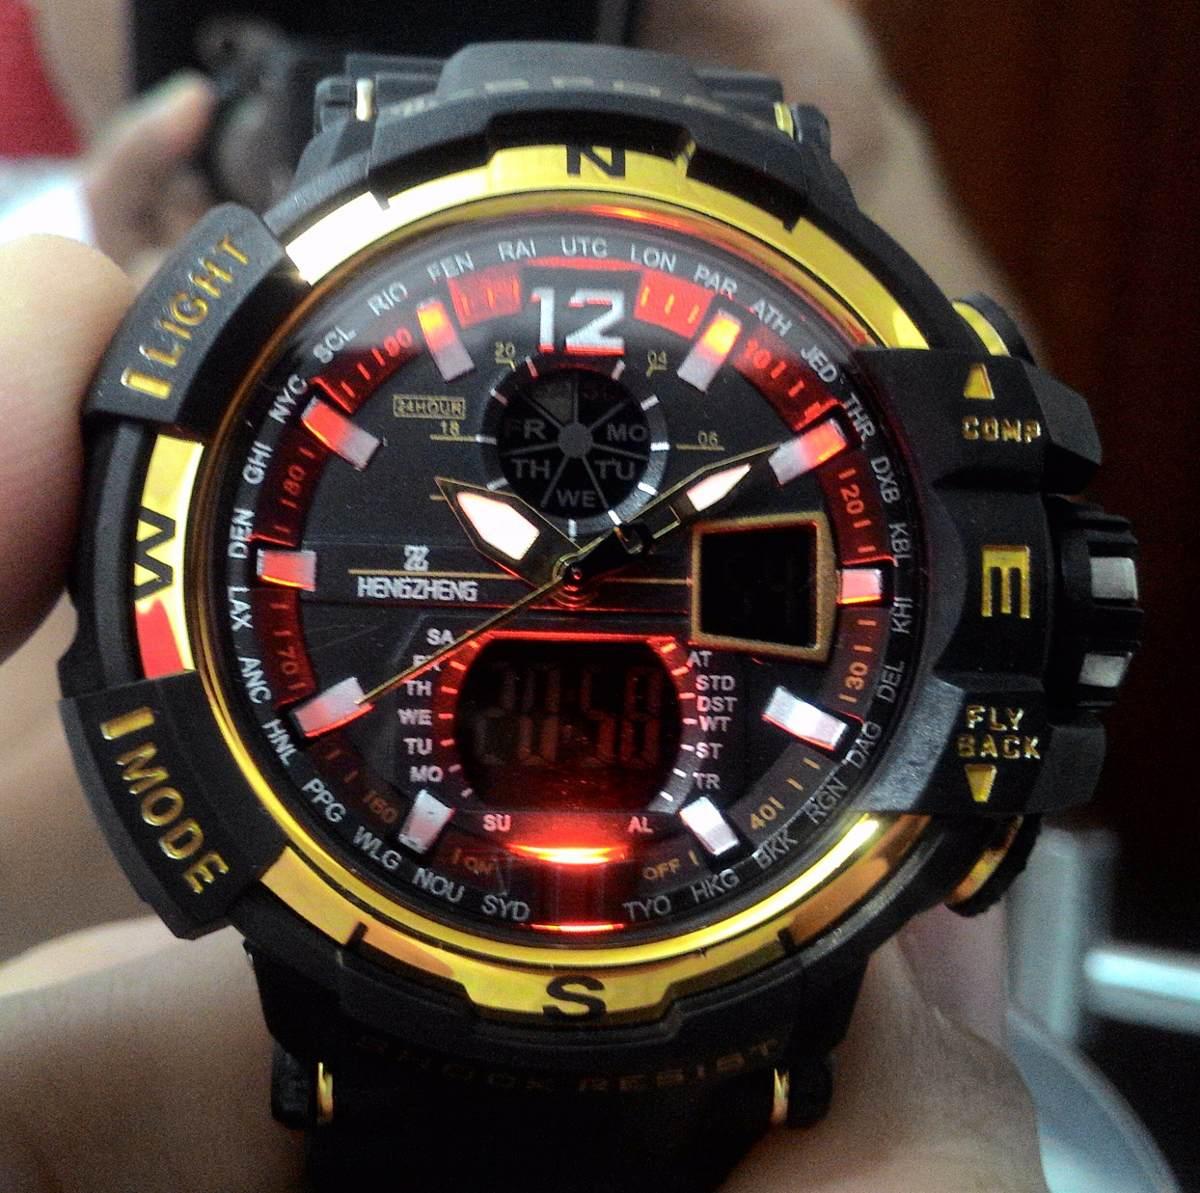 76c9eb7a97f Carregando zoom... relógio shock masculino pulso z sport 490 digital  analogico